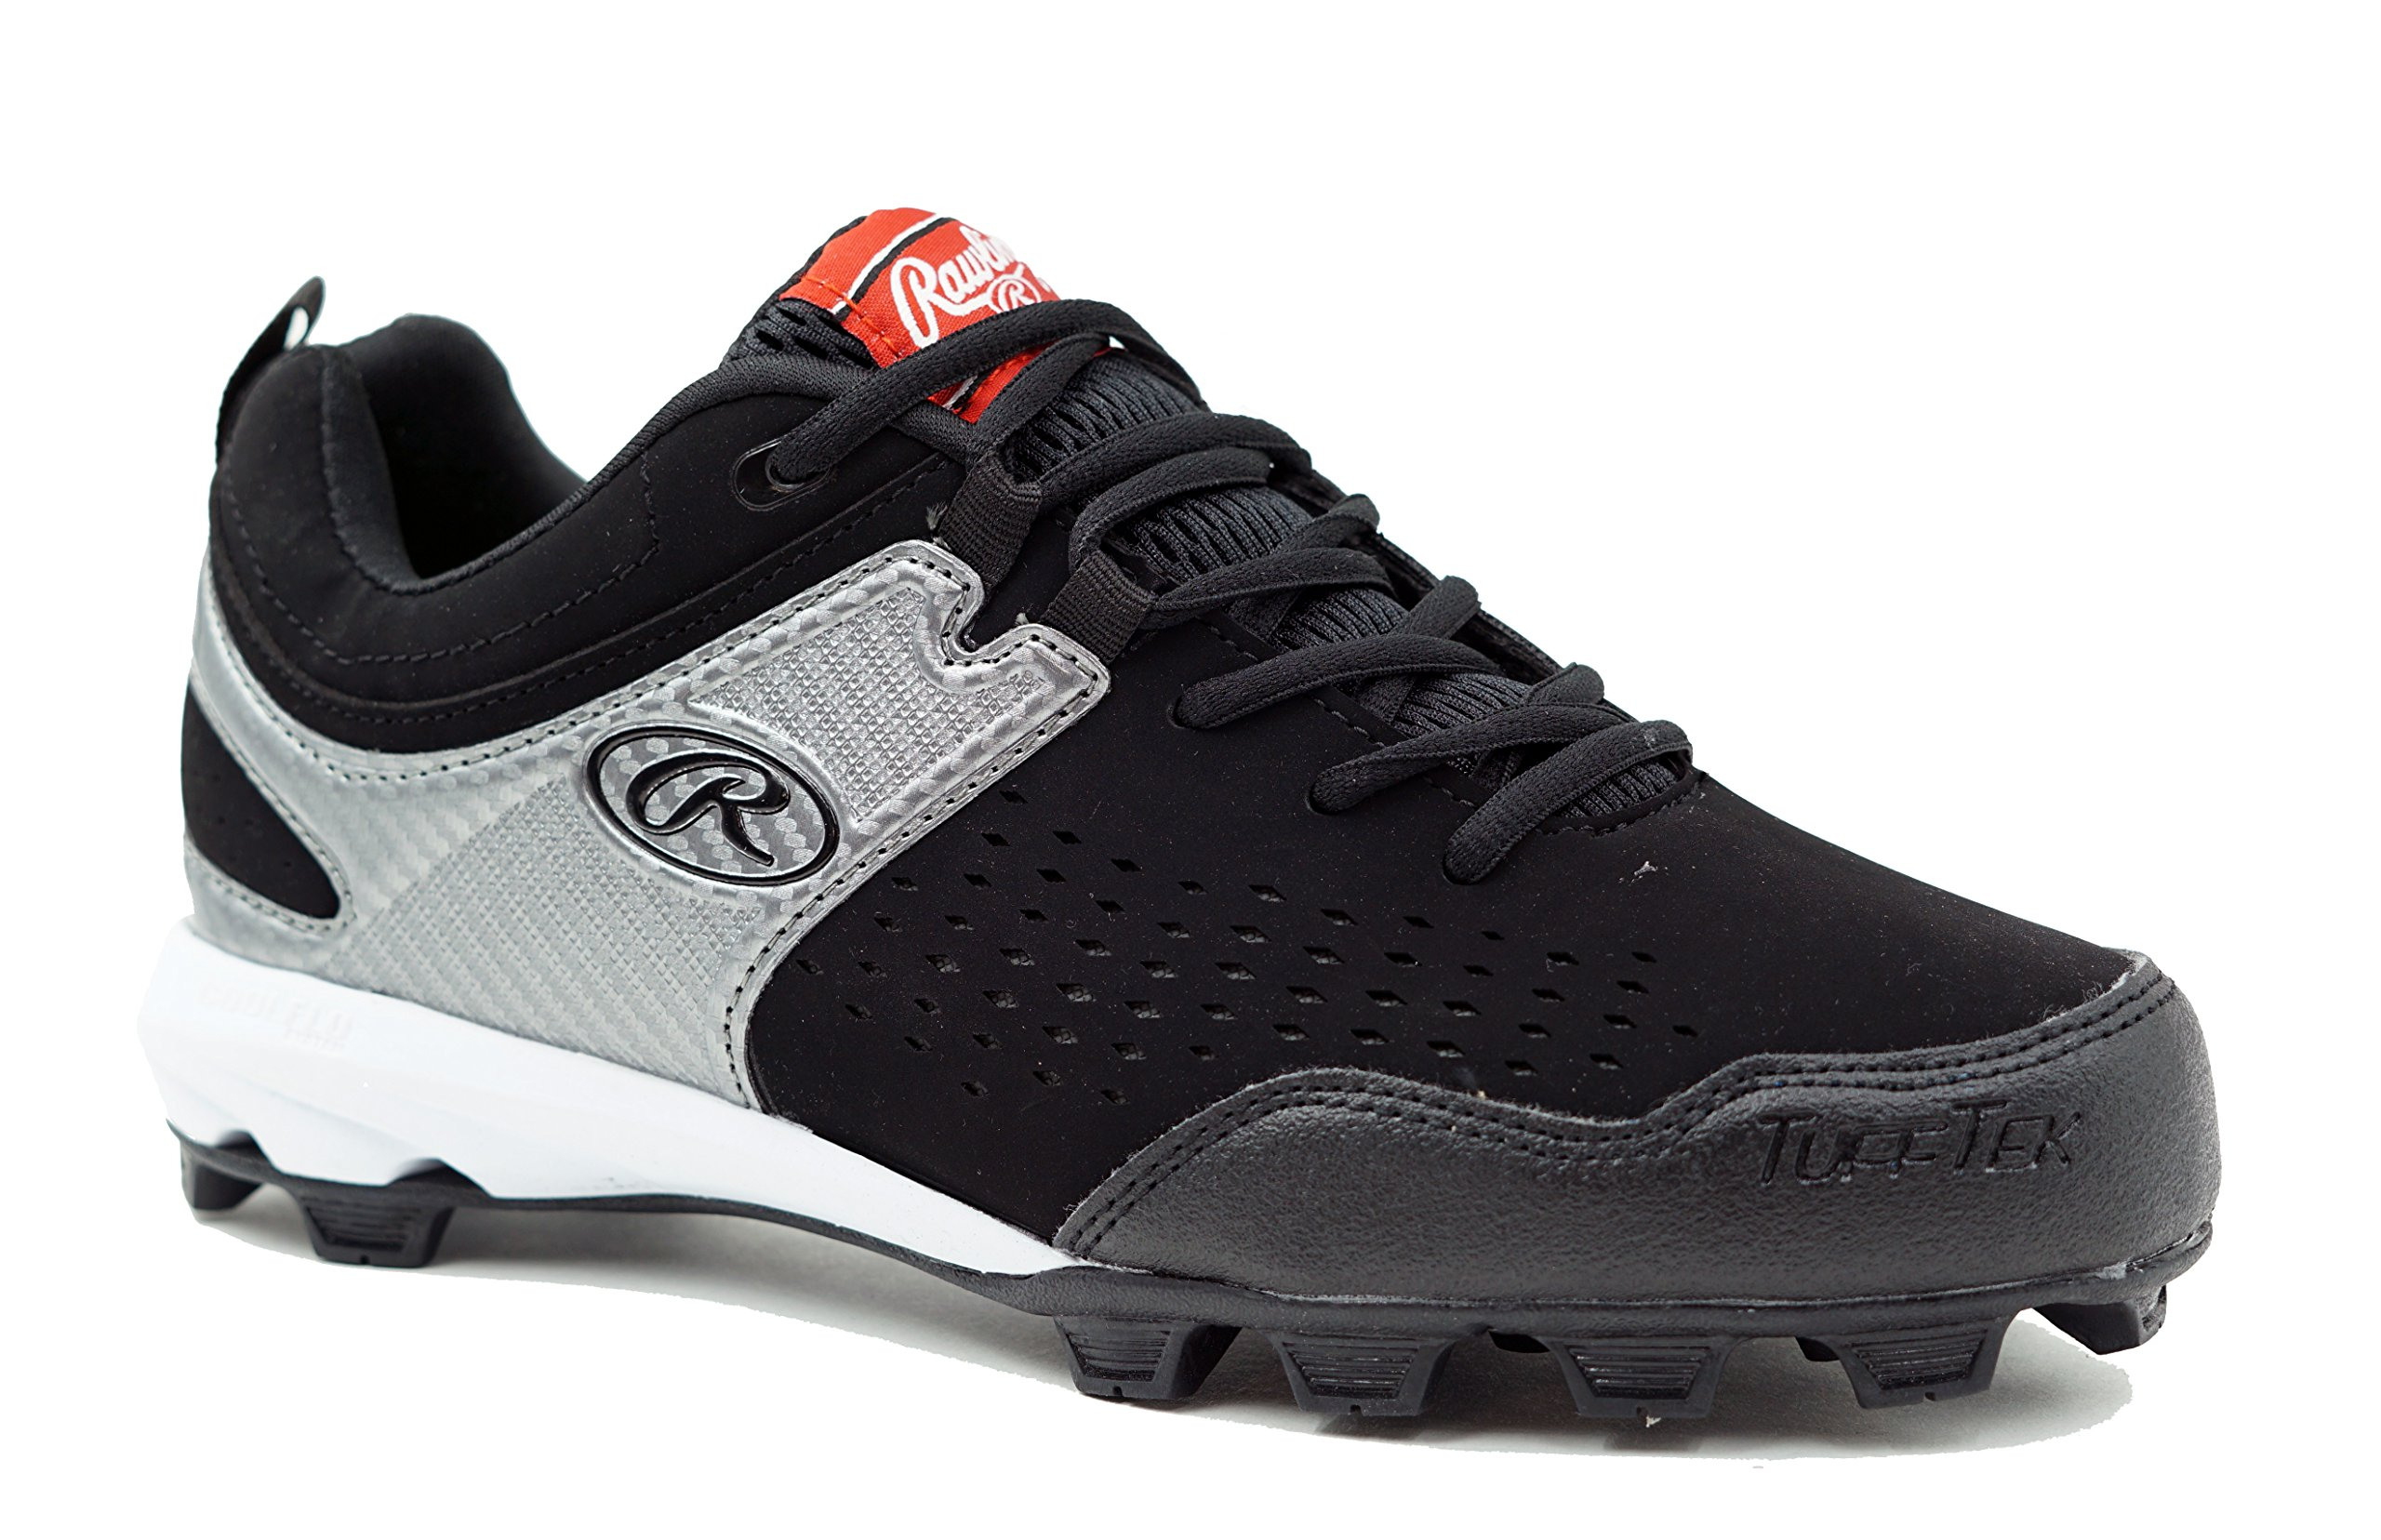 Rawlings Clubhouse Baseball Shoe, Black/Silver, 8.5 D US